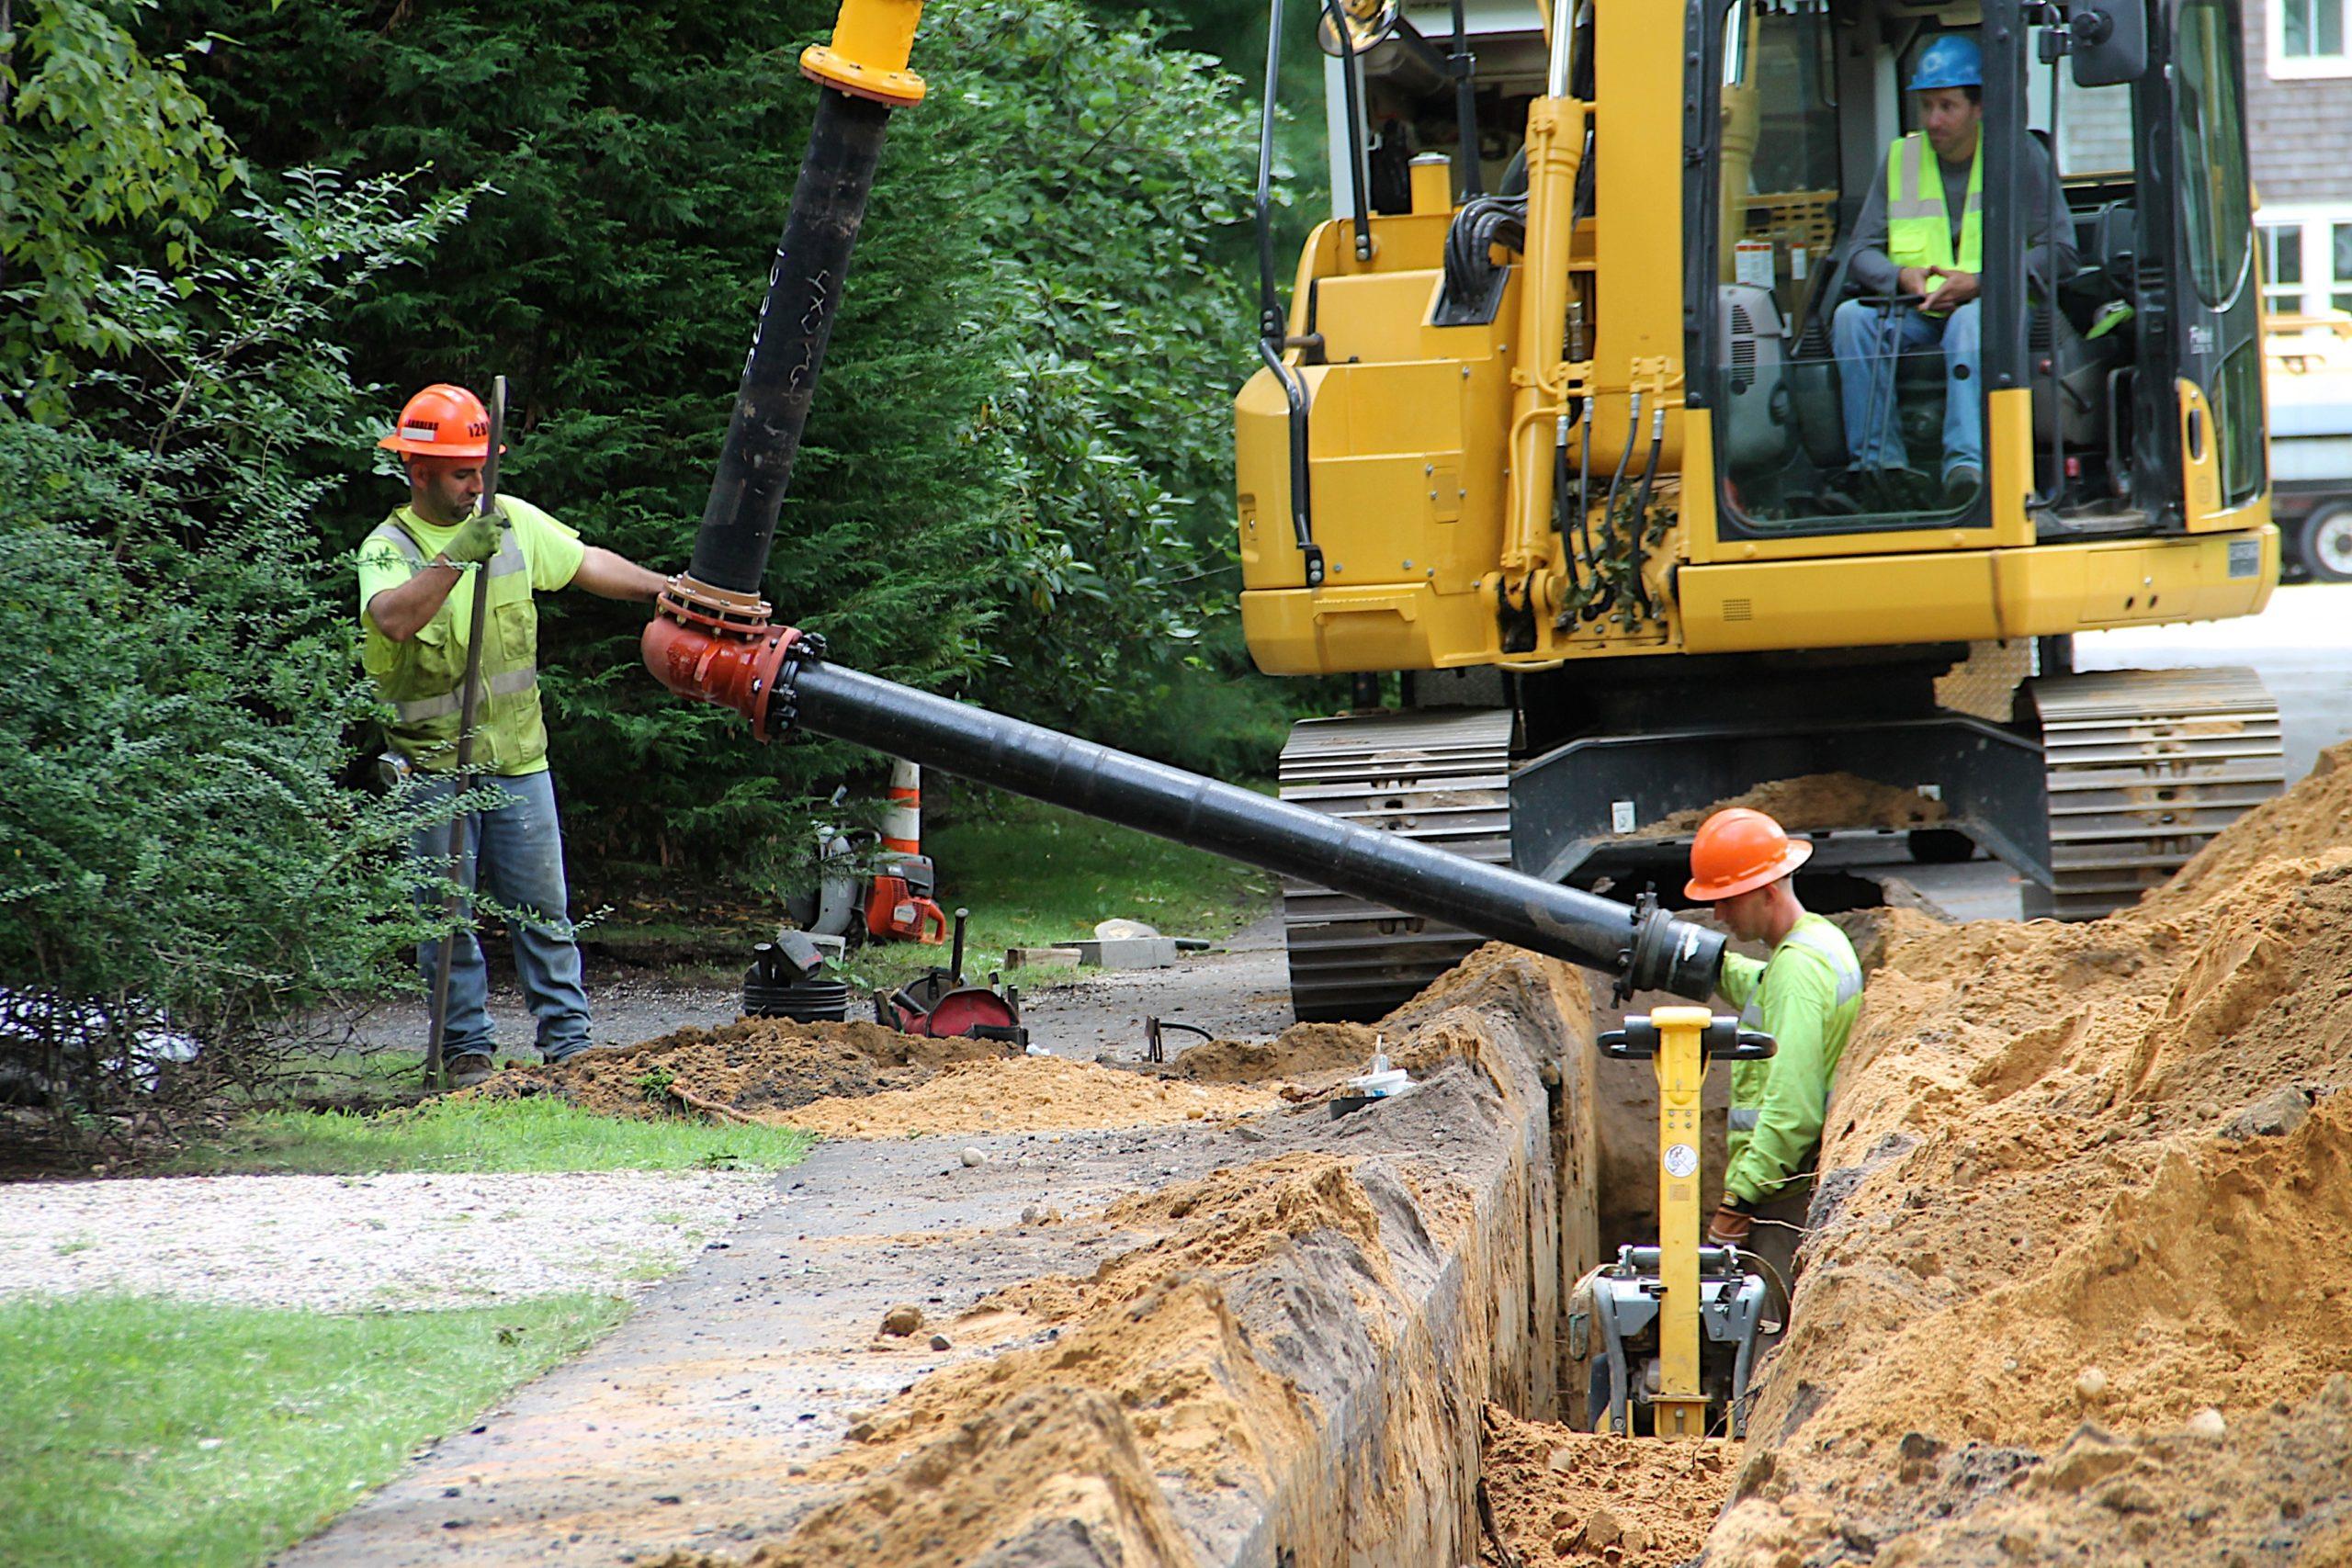 Suffok County Water Authority contractors installing water mains in Wainscott in 2018.